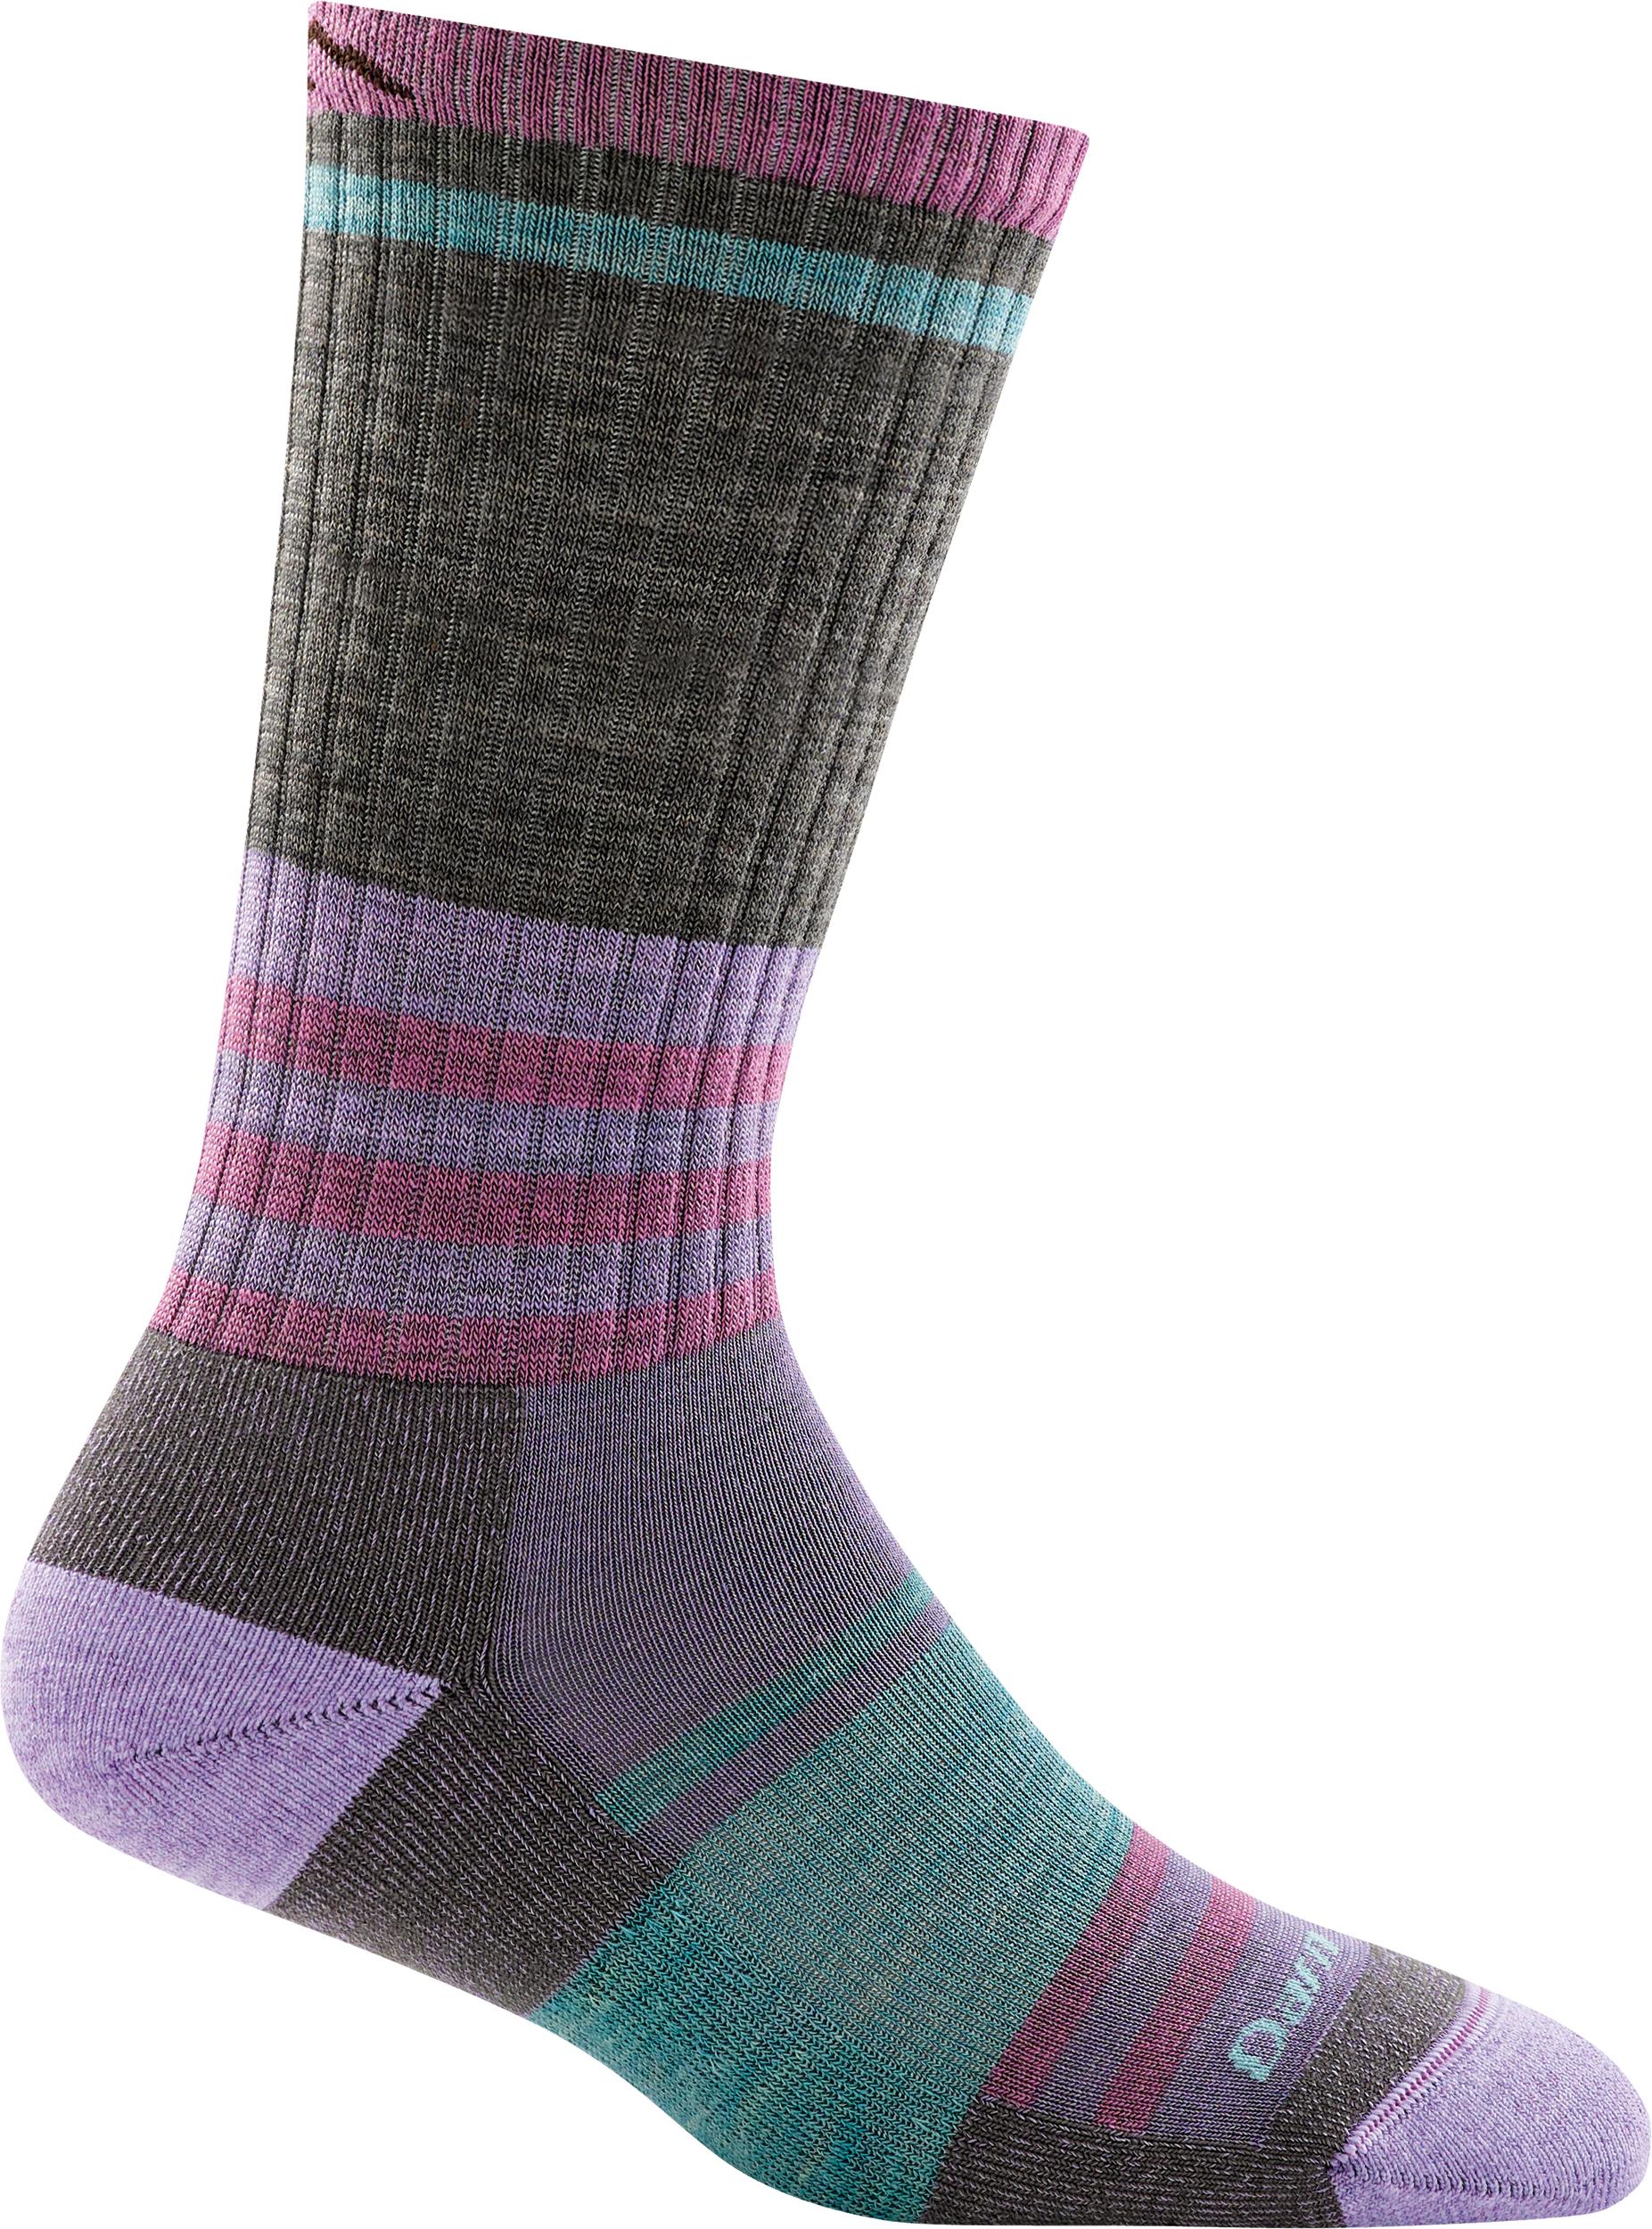 2636752c626ba Darn Tough Her Spur Light Cushion Hiker Boot Socks - Women's | MEC